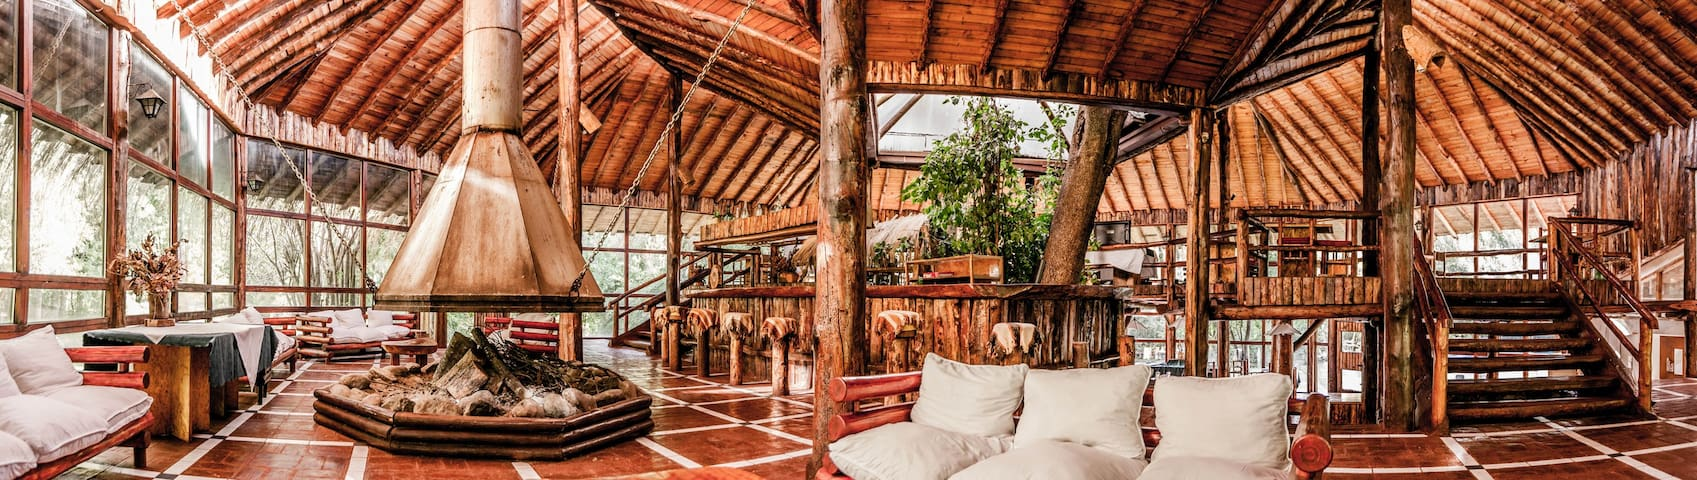 Hotel Melado, Lodge de montaña. Comidas incluidas.